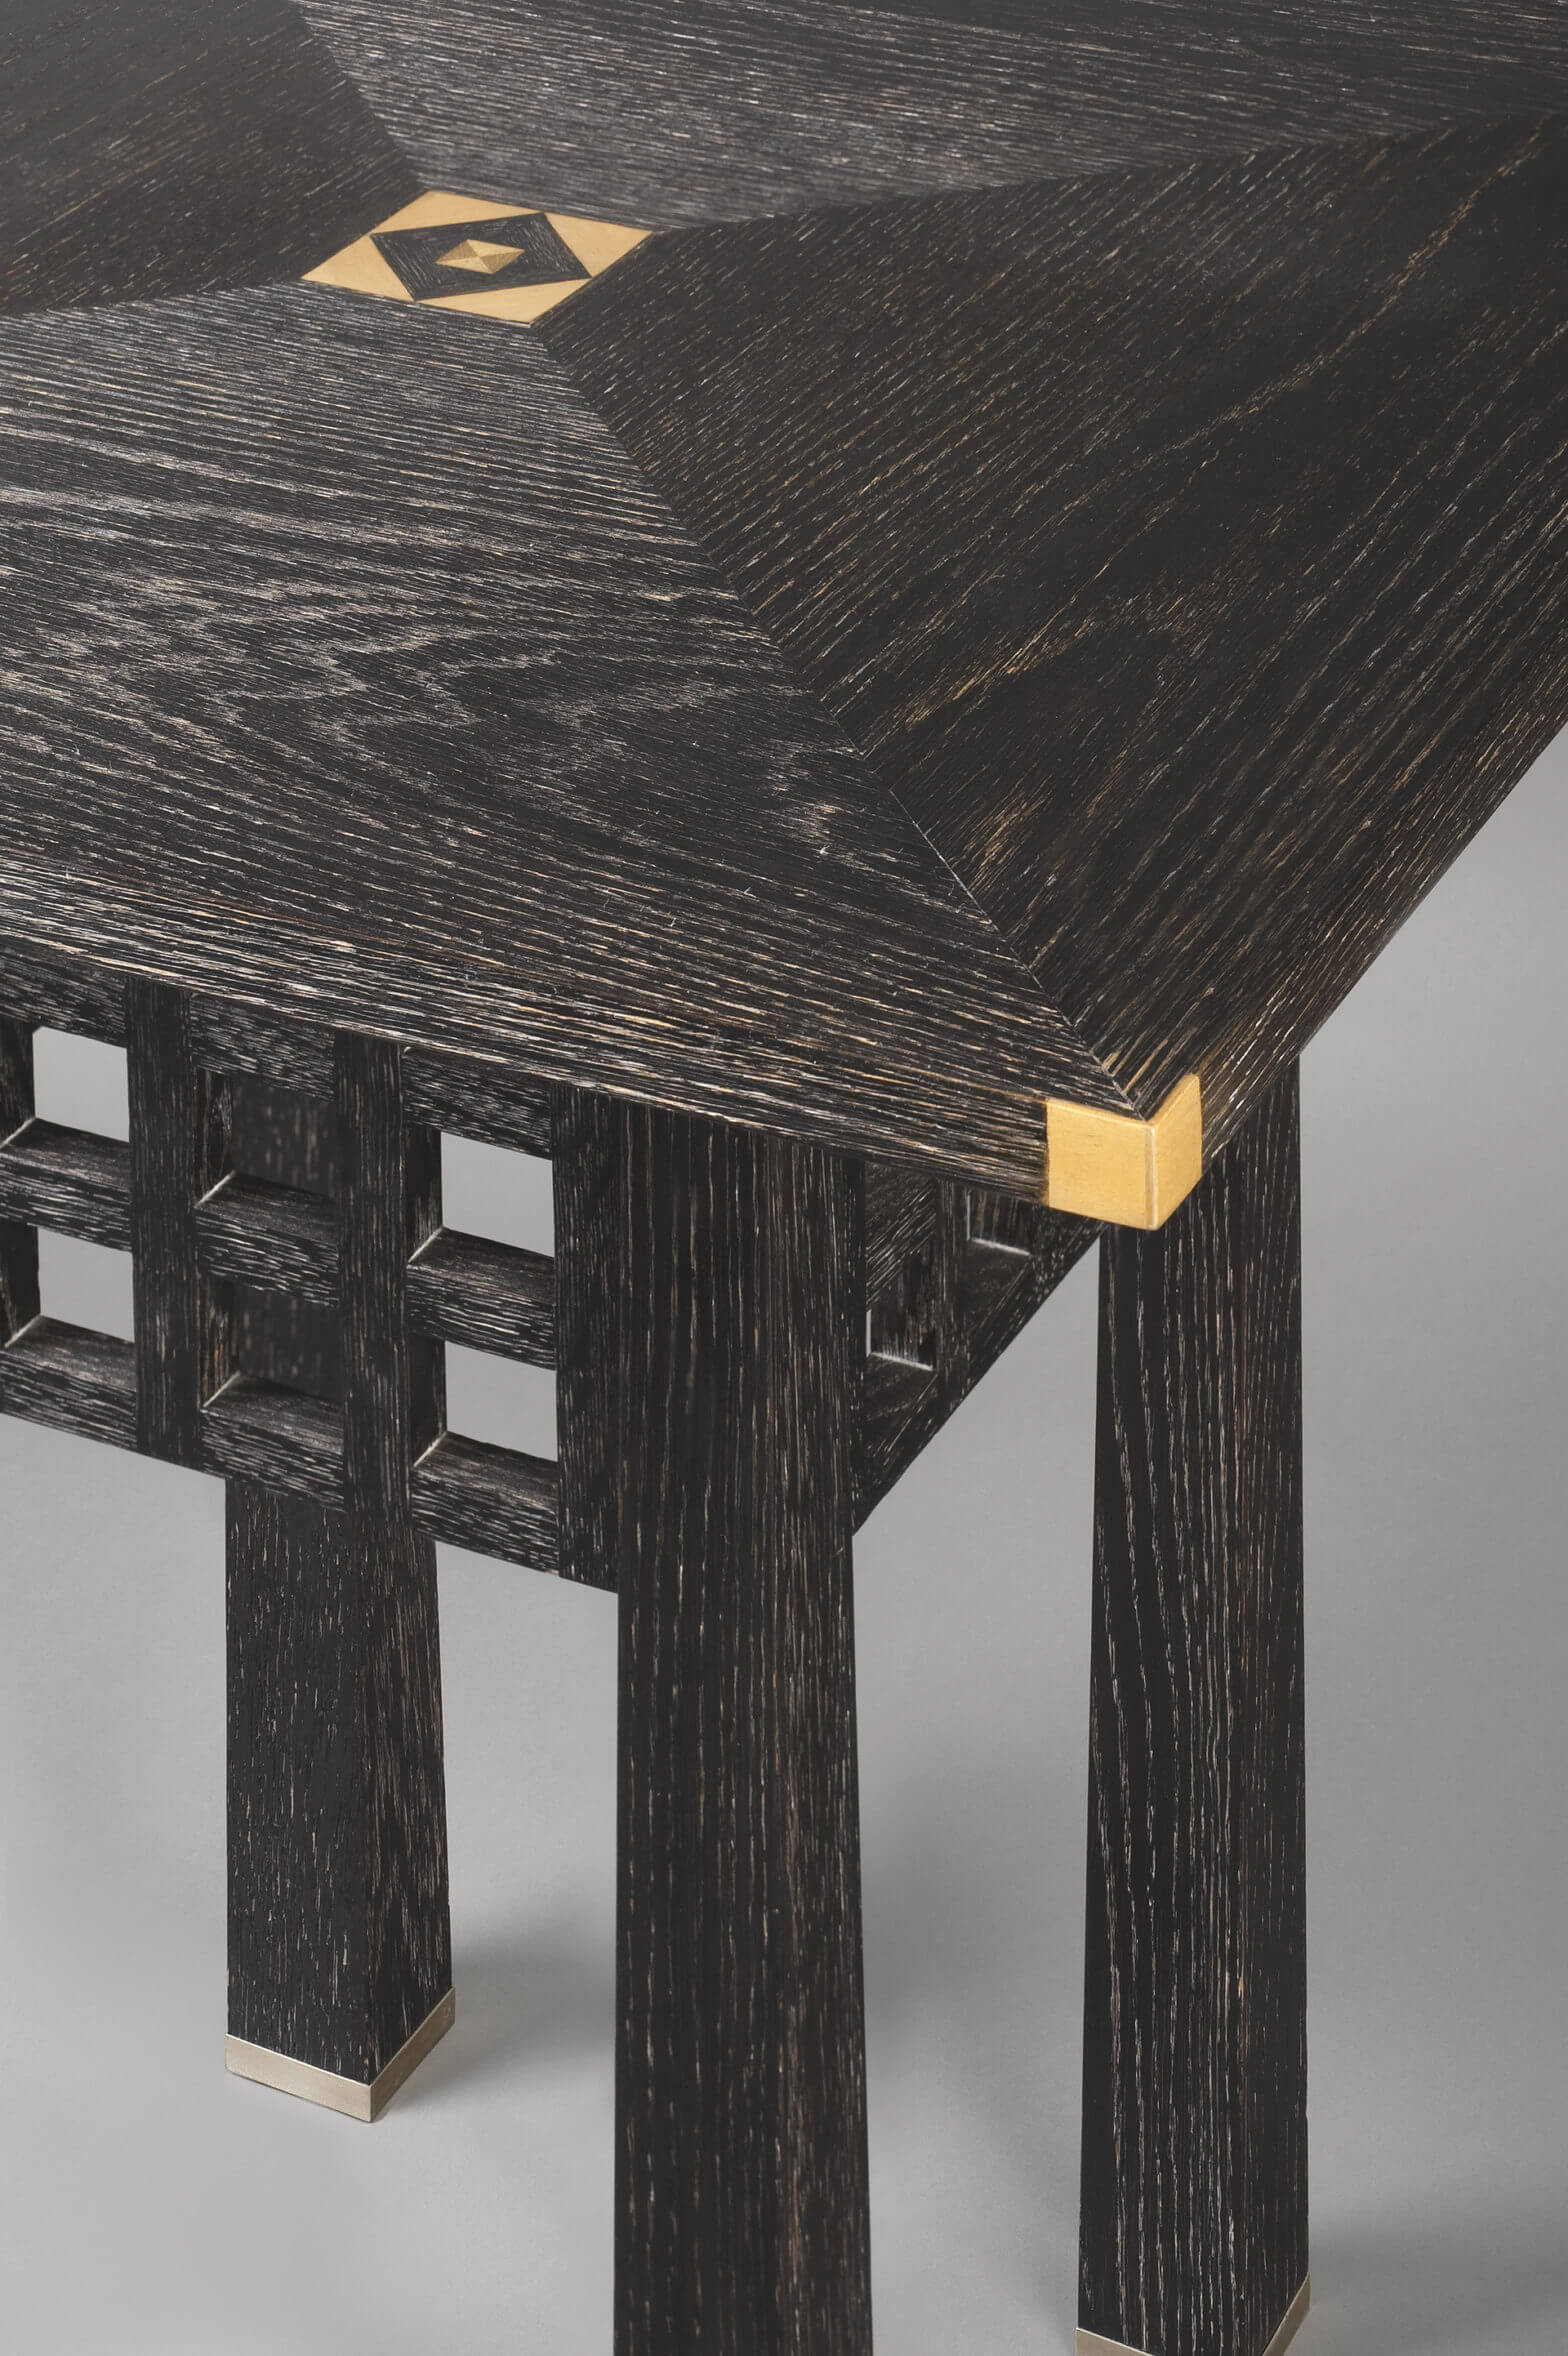 Josef Hoffmann- Side table for Hugo Koller and his wife Broncia Koller-Pinell